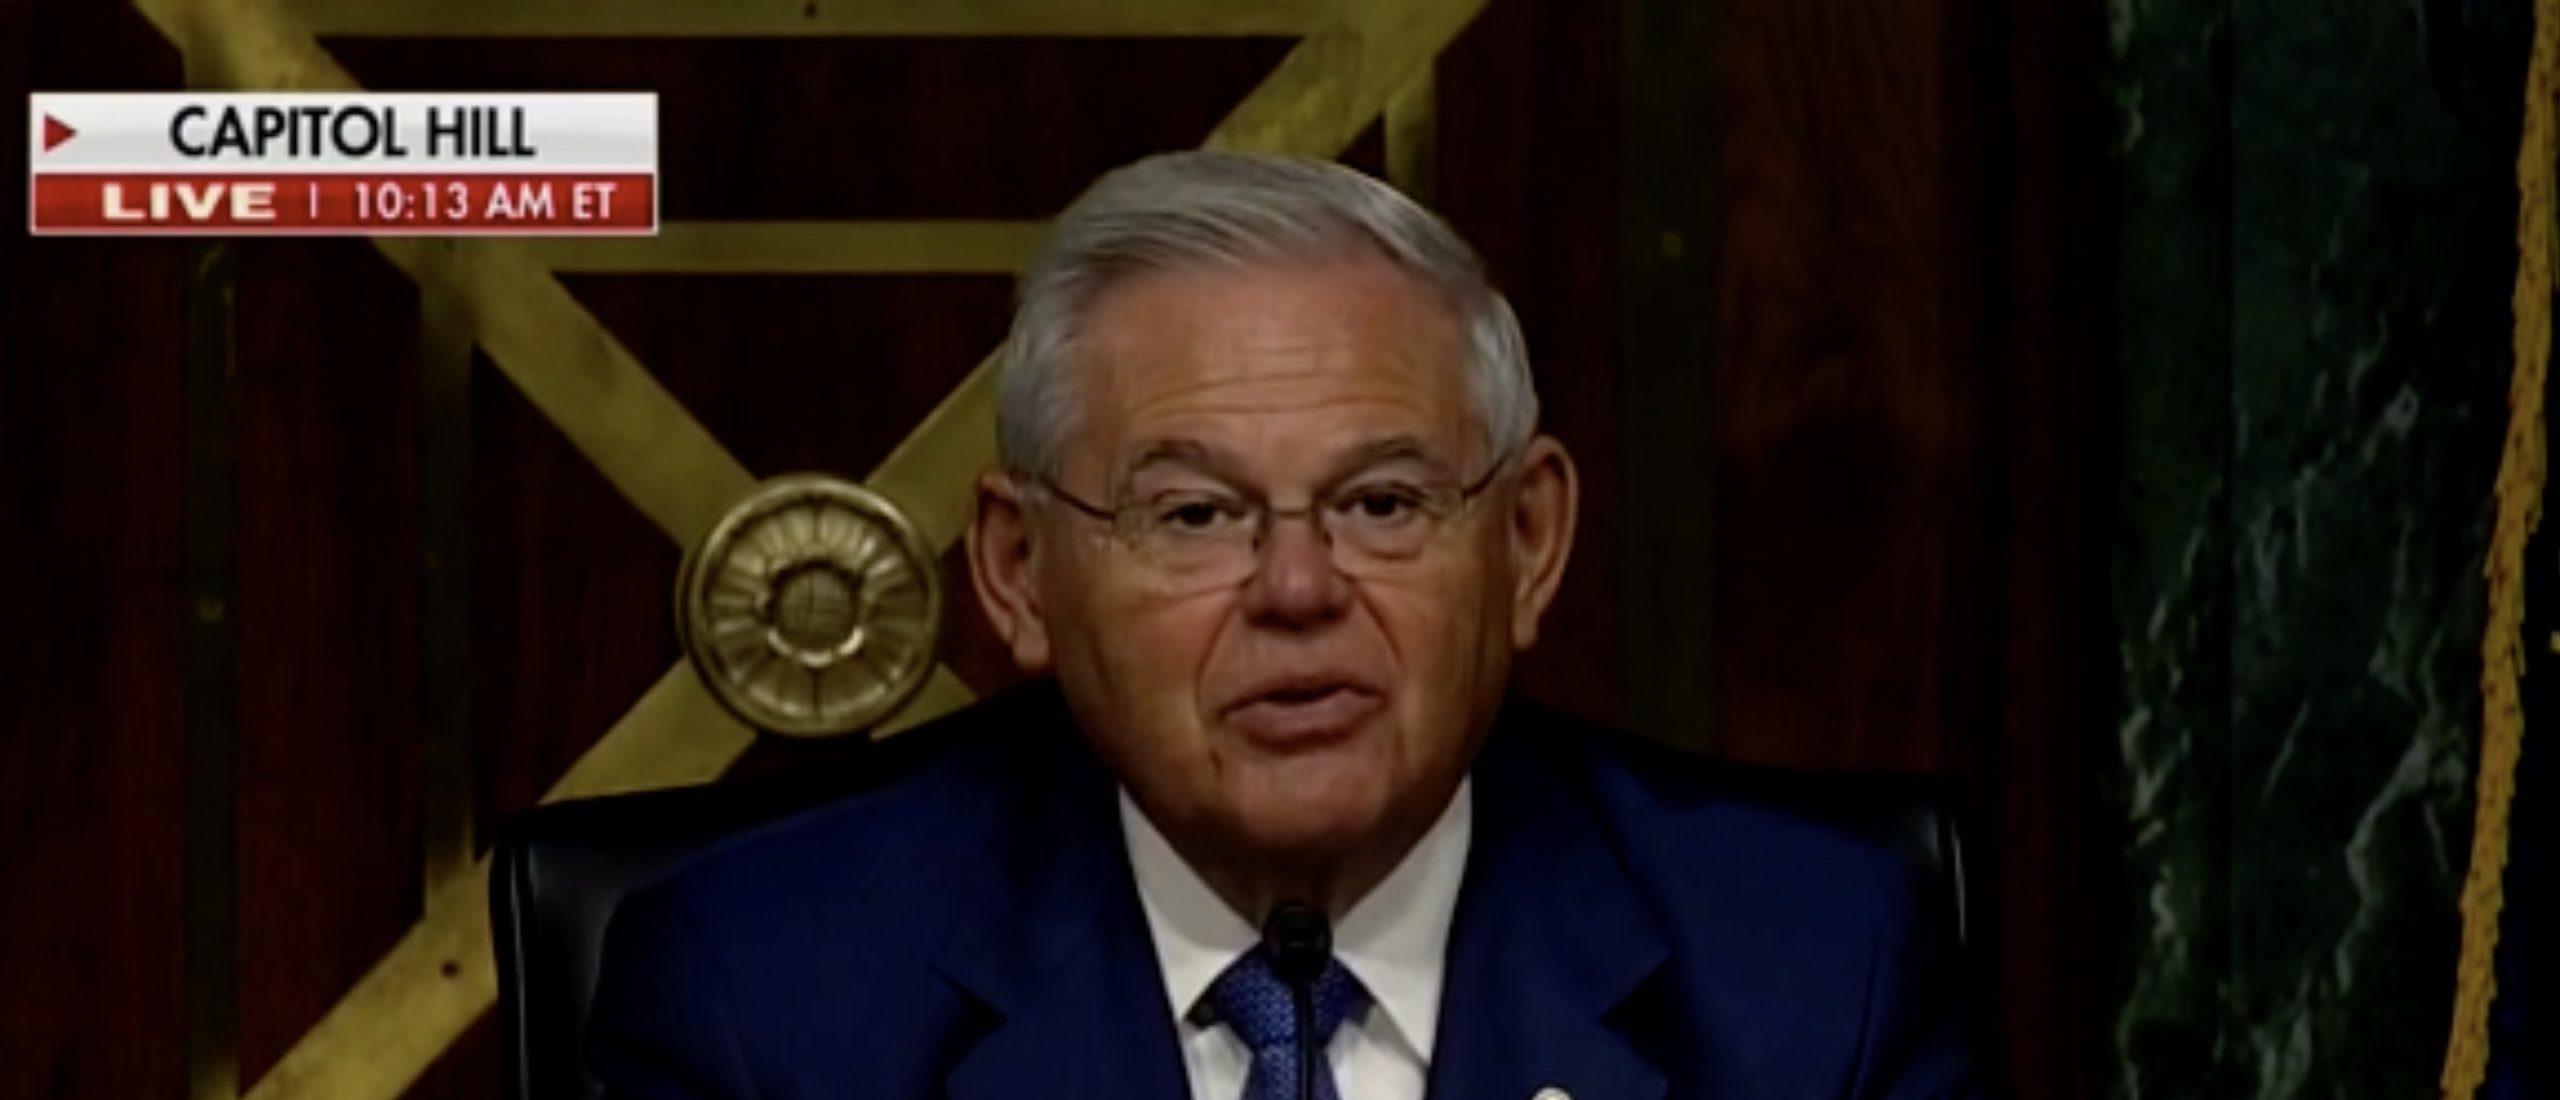 Sen. Menendez Threatens To Subpoena Defense Secretary Lloyd Austin Over His Refusal To Answer For Afghanistan